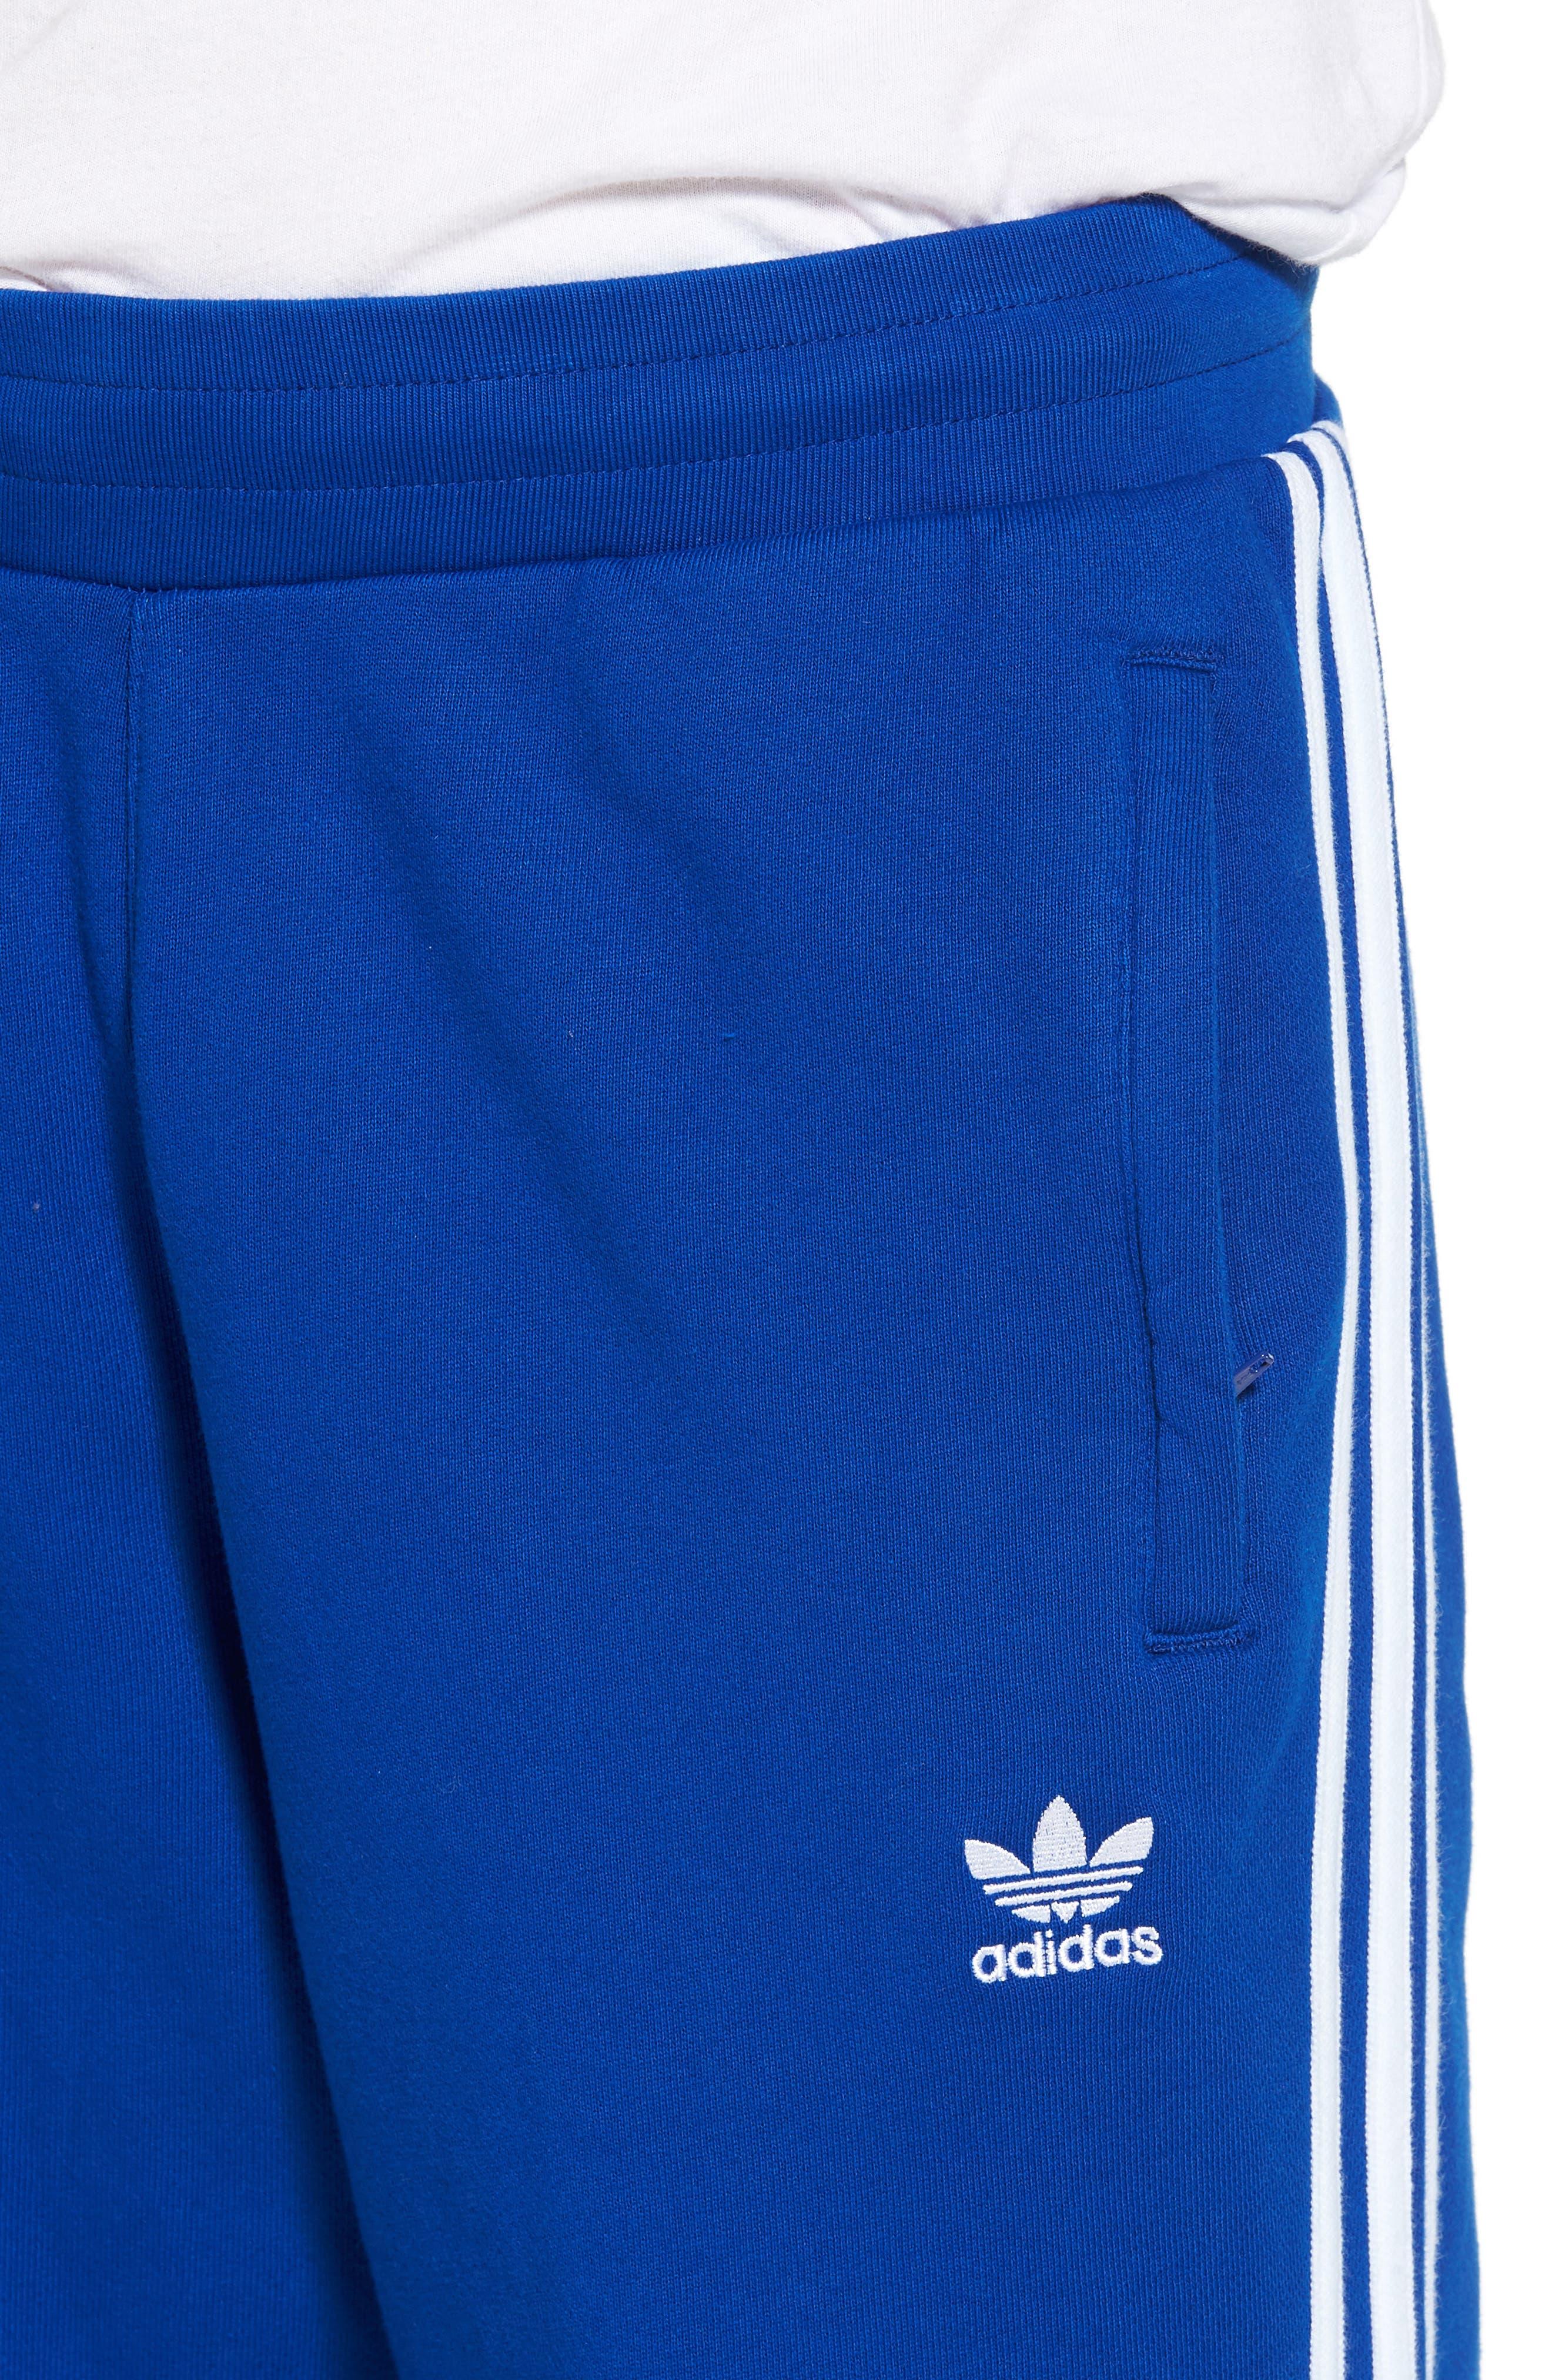 3-Stripes Sweatpants,                             Alternate thumbnail 4, color,                             Collegiate Royal